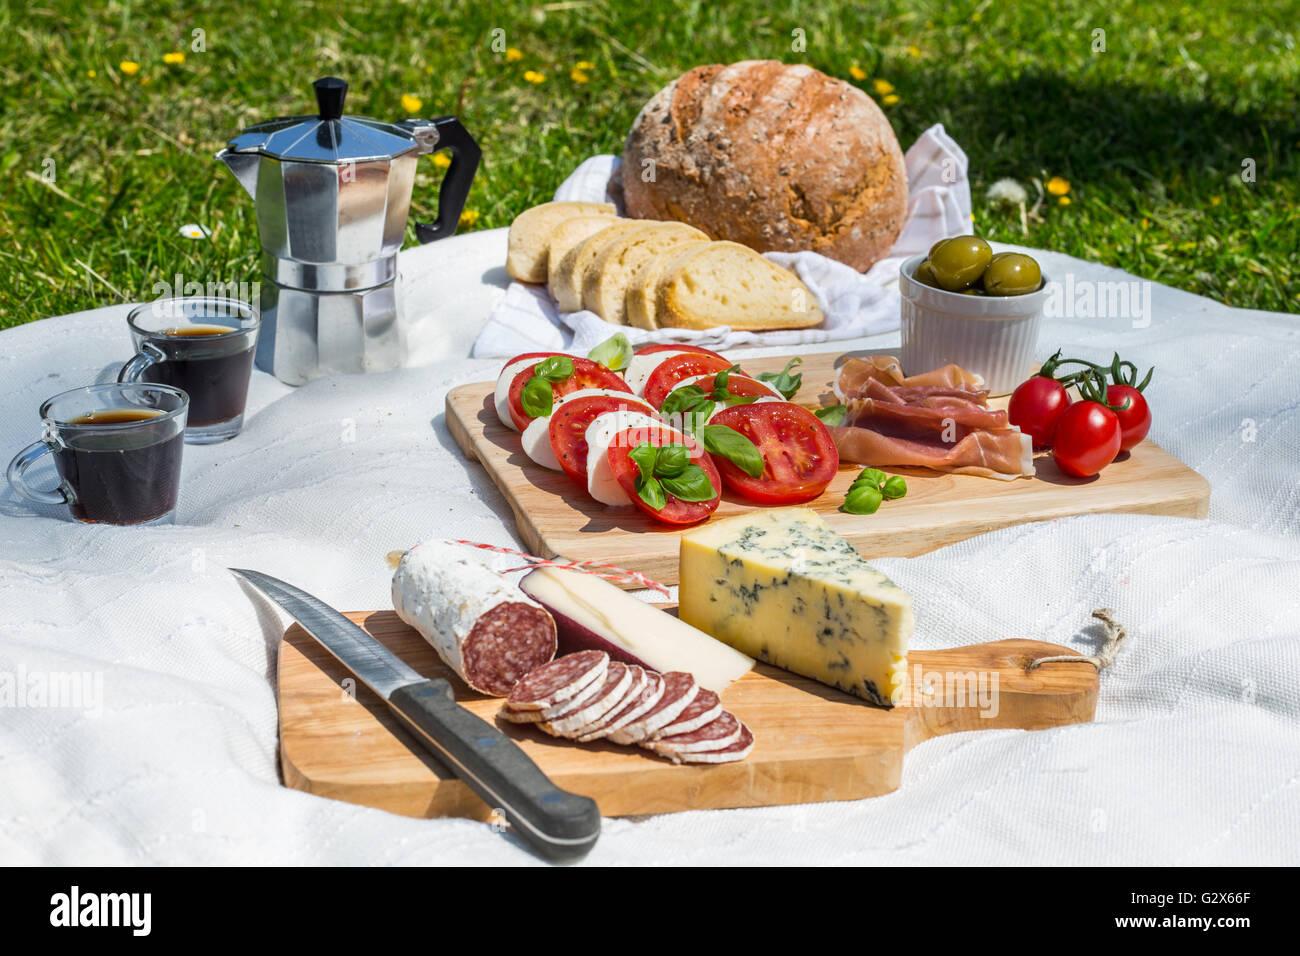 Picknick im freien bestehend Bauernbrot, Ciabatta, Espresso Tassen, Oliven, Tomaten, Parmaschinken, mozzarella Stockbild